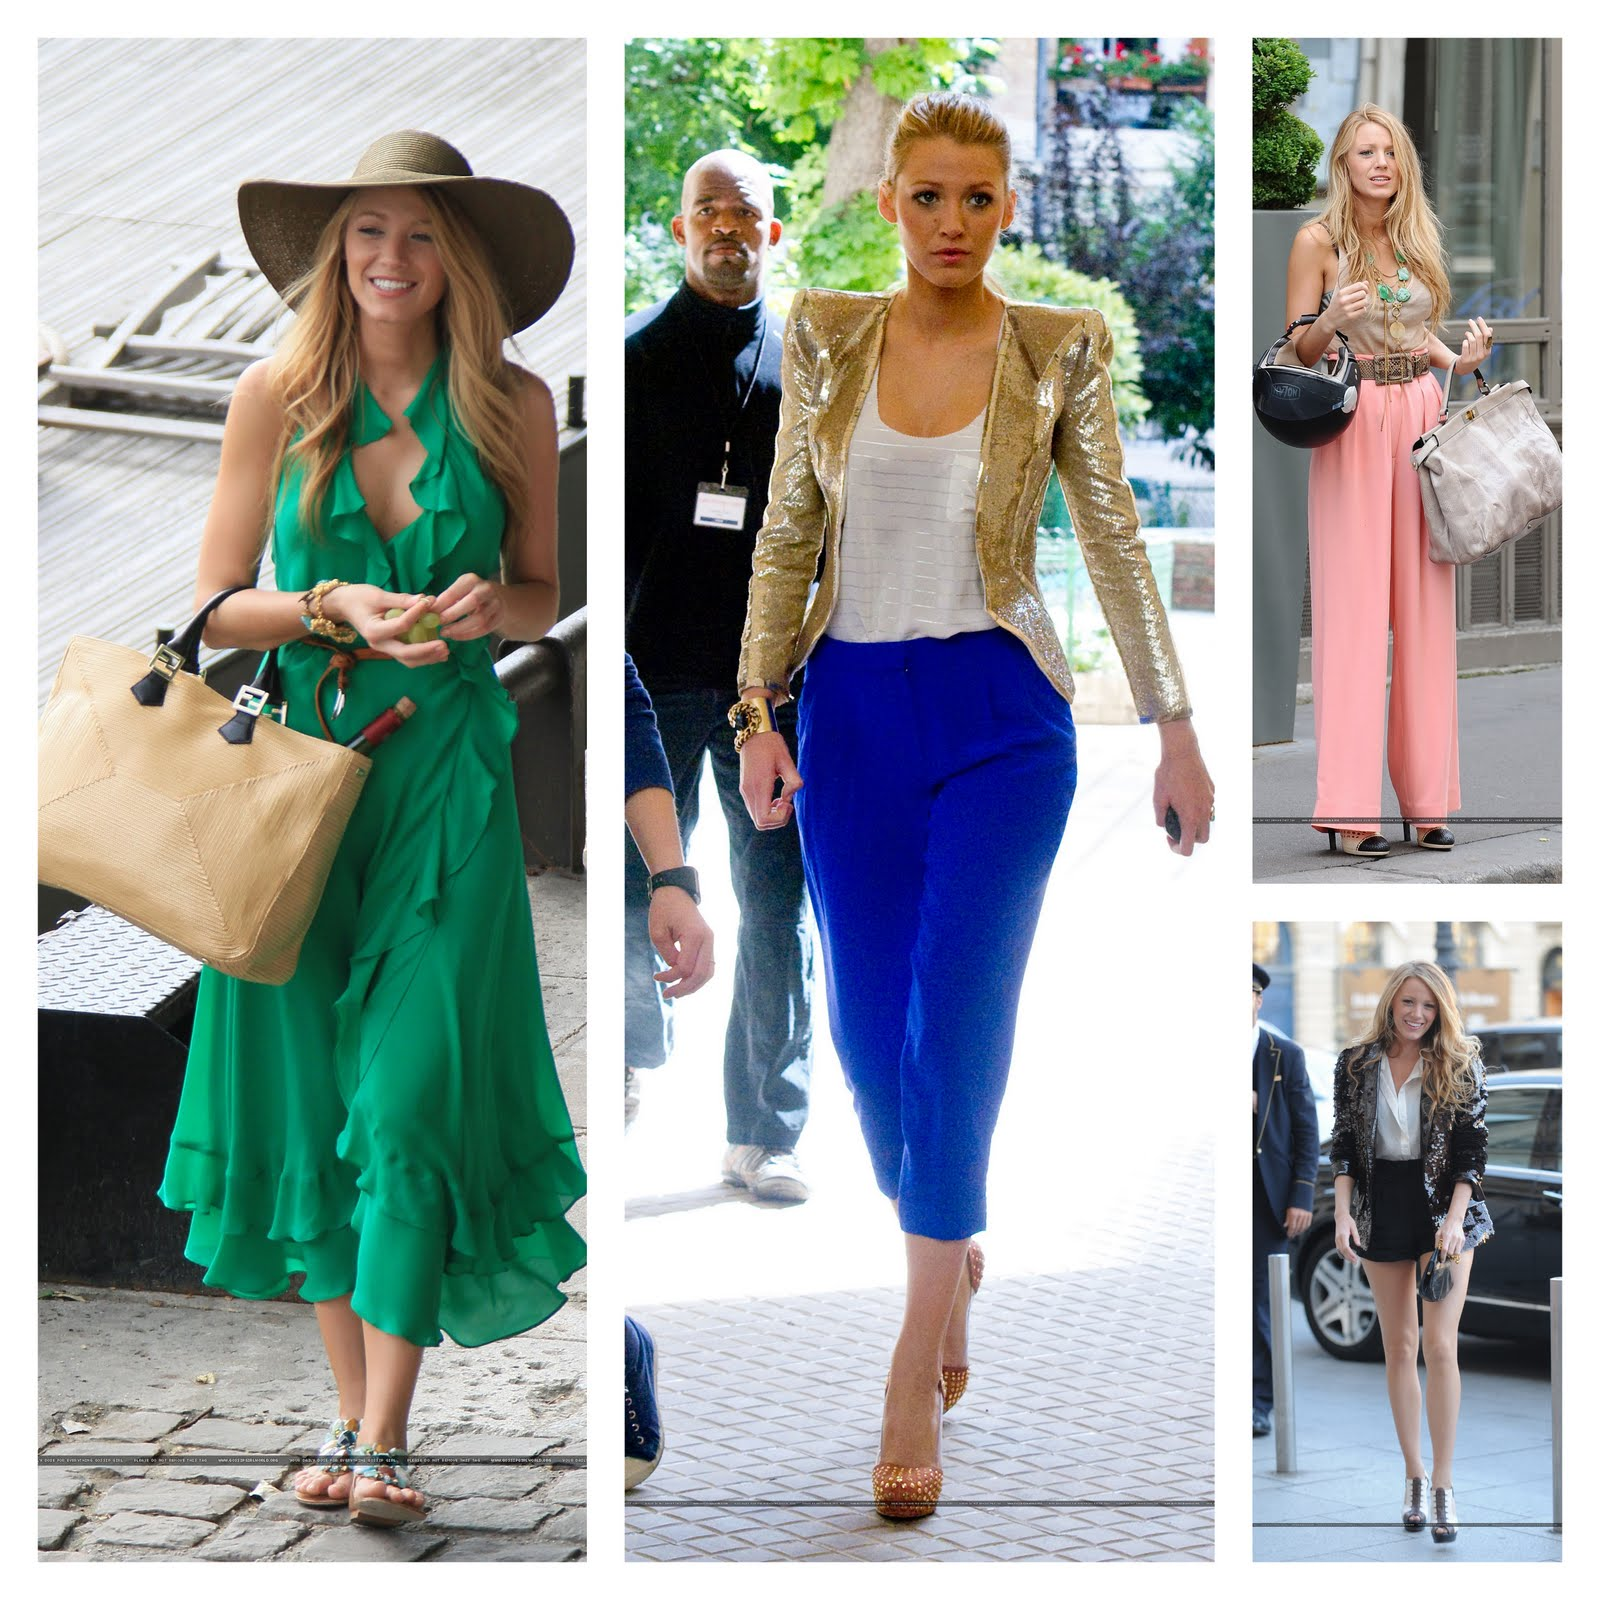 Islandgirlchelle Upper East Side Fashion Gossip Girl